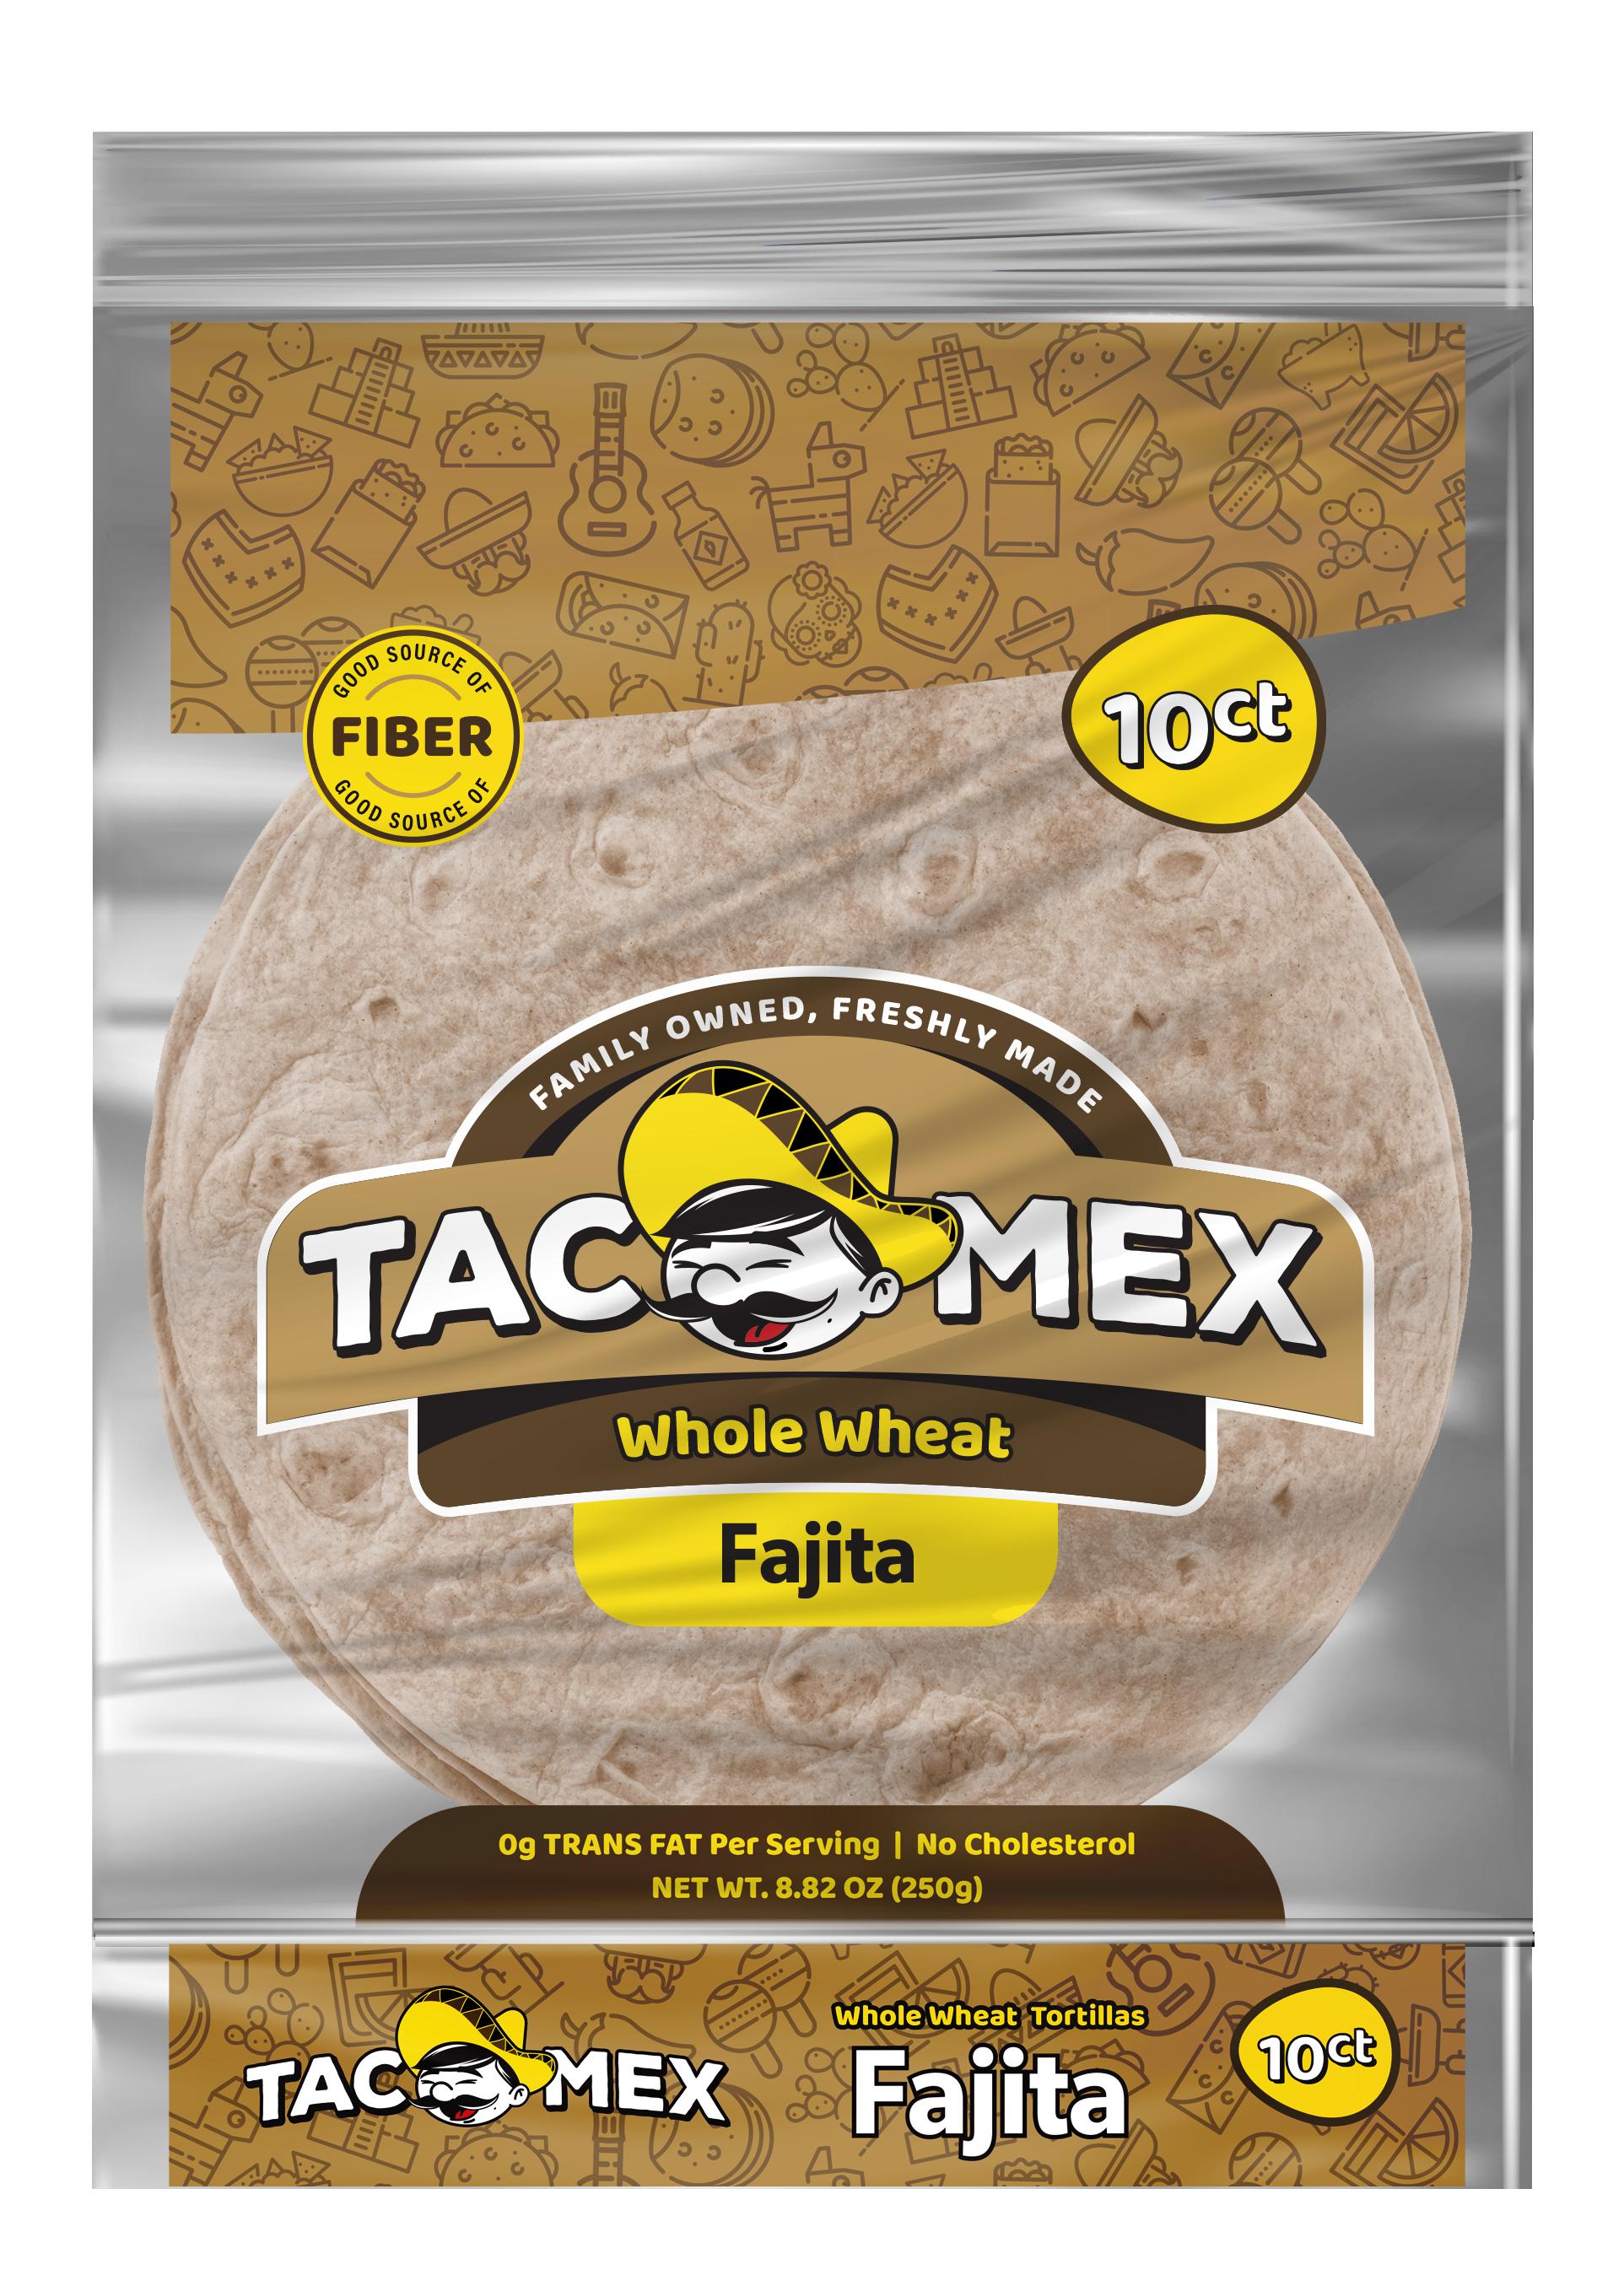 Tacomex fajita whole wheat tortilla